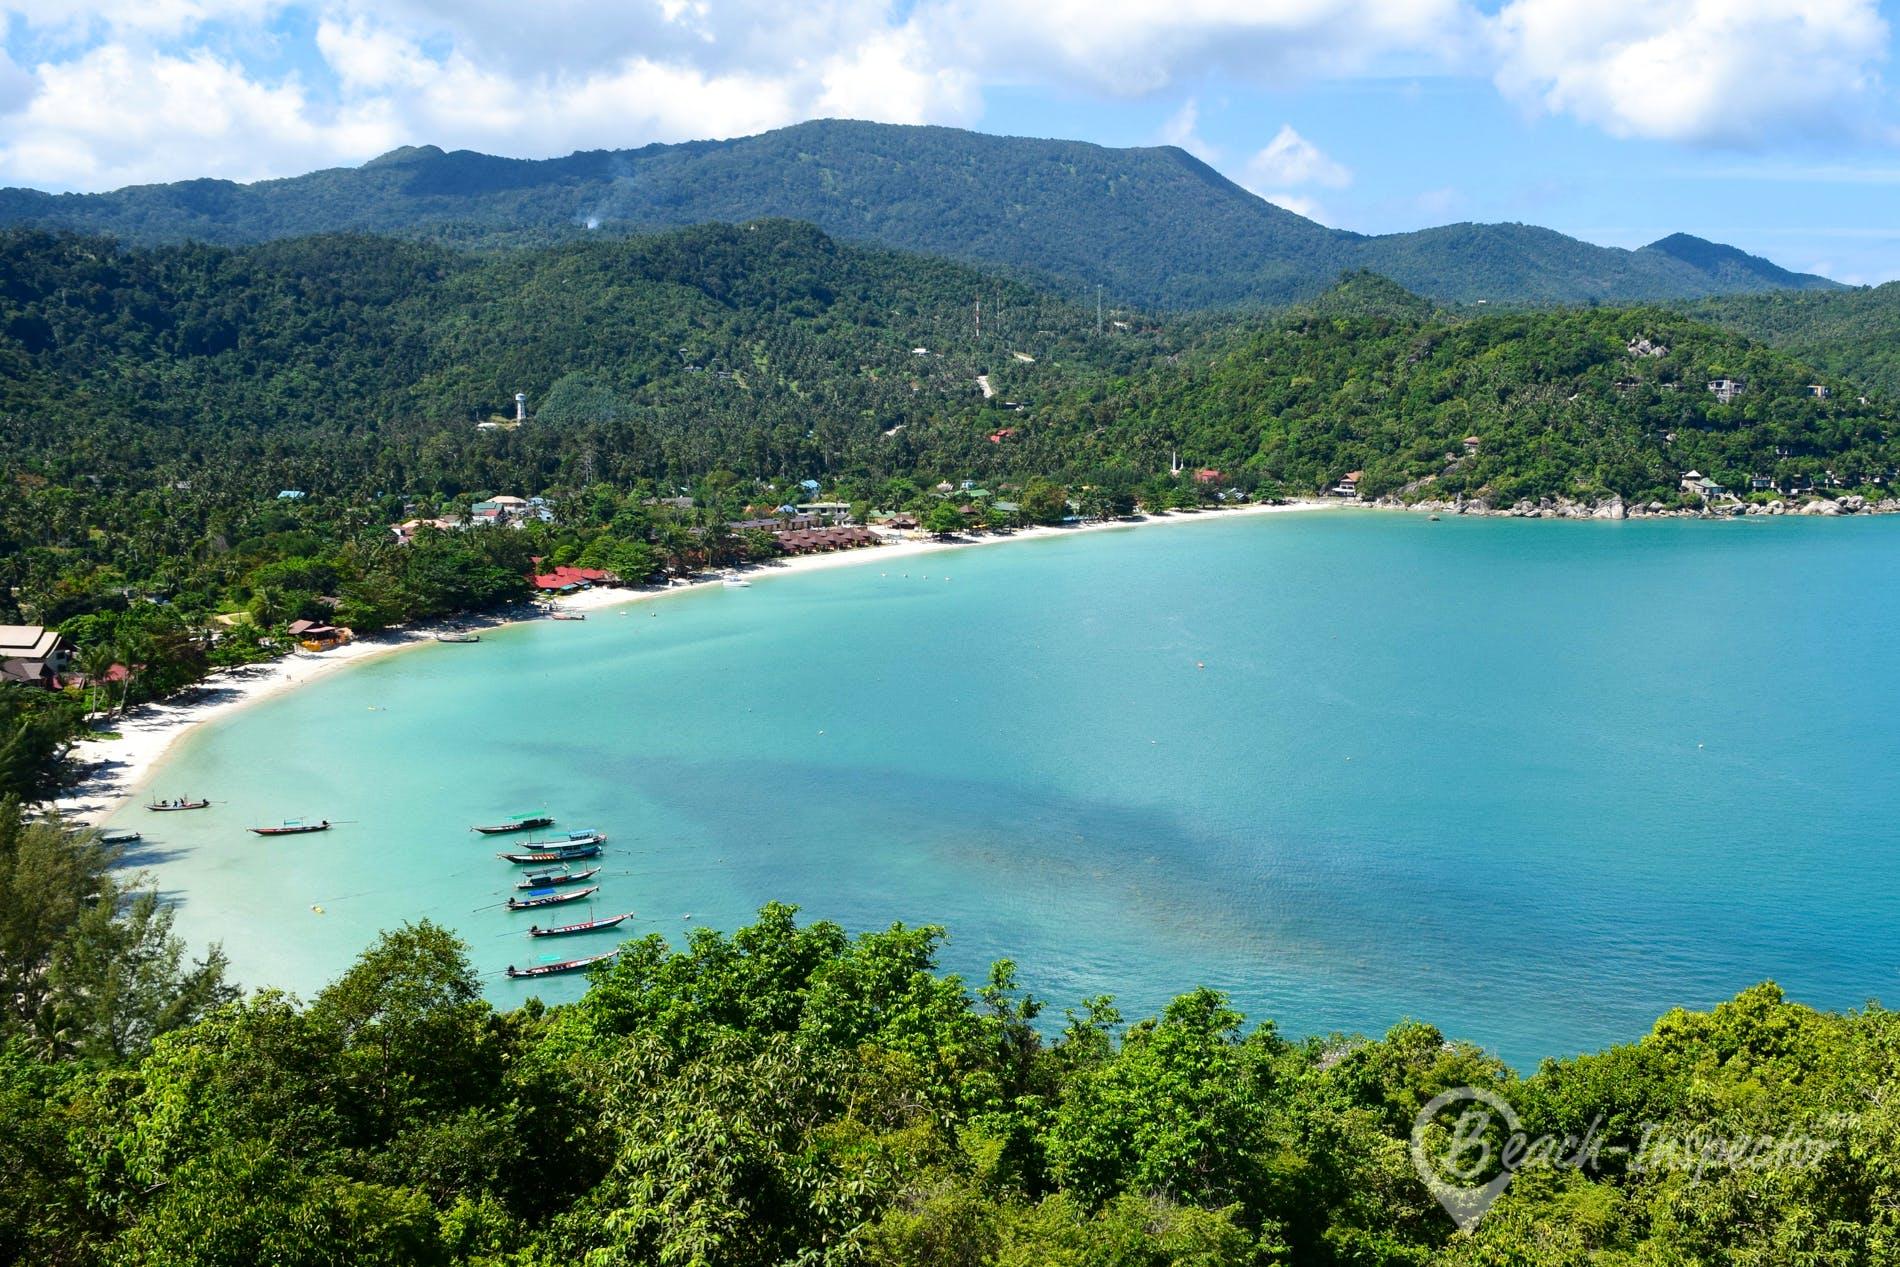 Strand Thong Nai Pan Yai Beach, Koh Phangan, Thailand